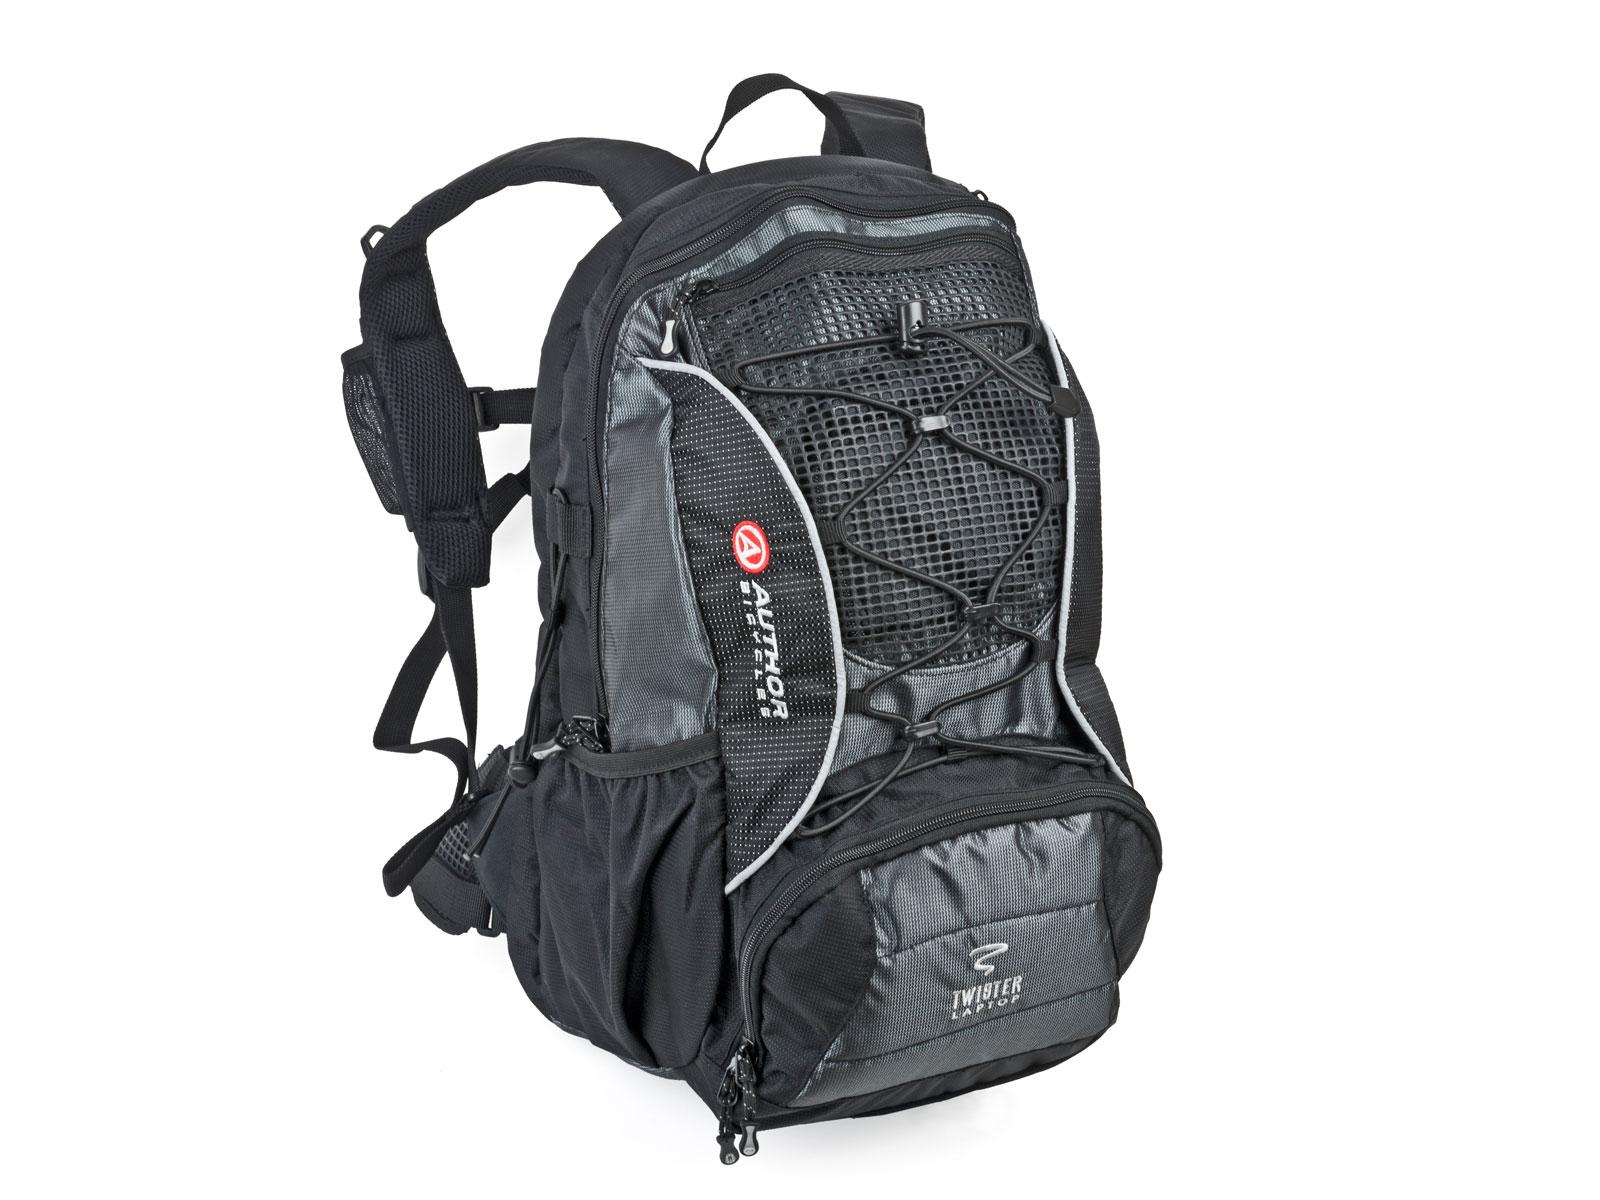 d8af79068bb Batoh A-B Twister Laptop (černá šedá) (UA 08100060) - UNIAG.biz - UNIVERSE  AGENCY spol. s r.o. - B2B